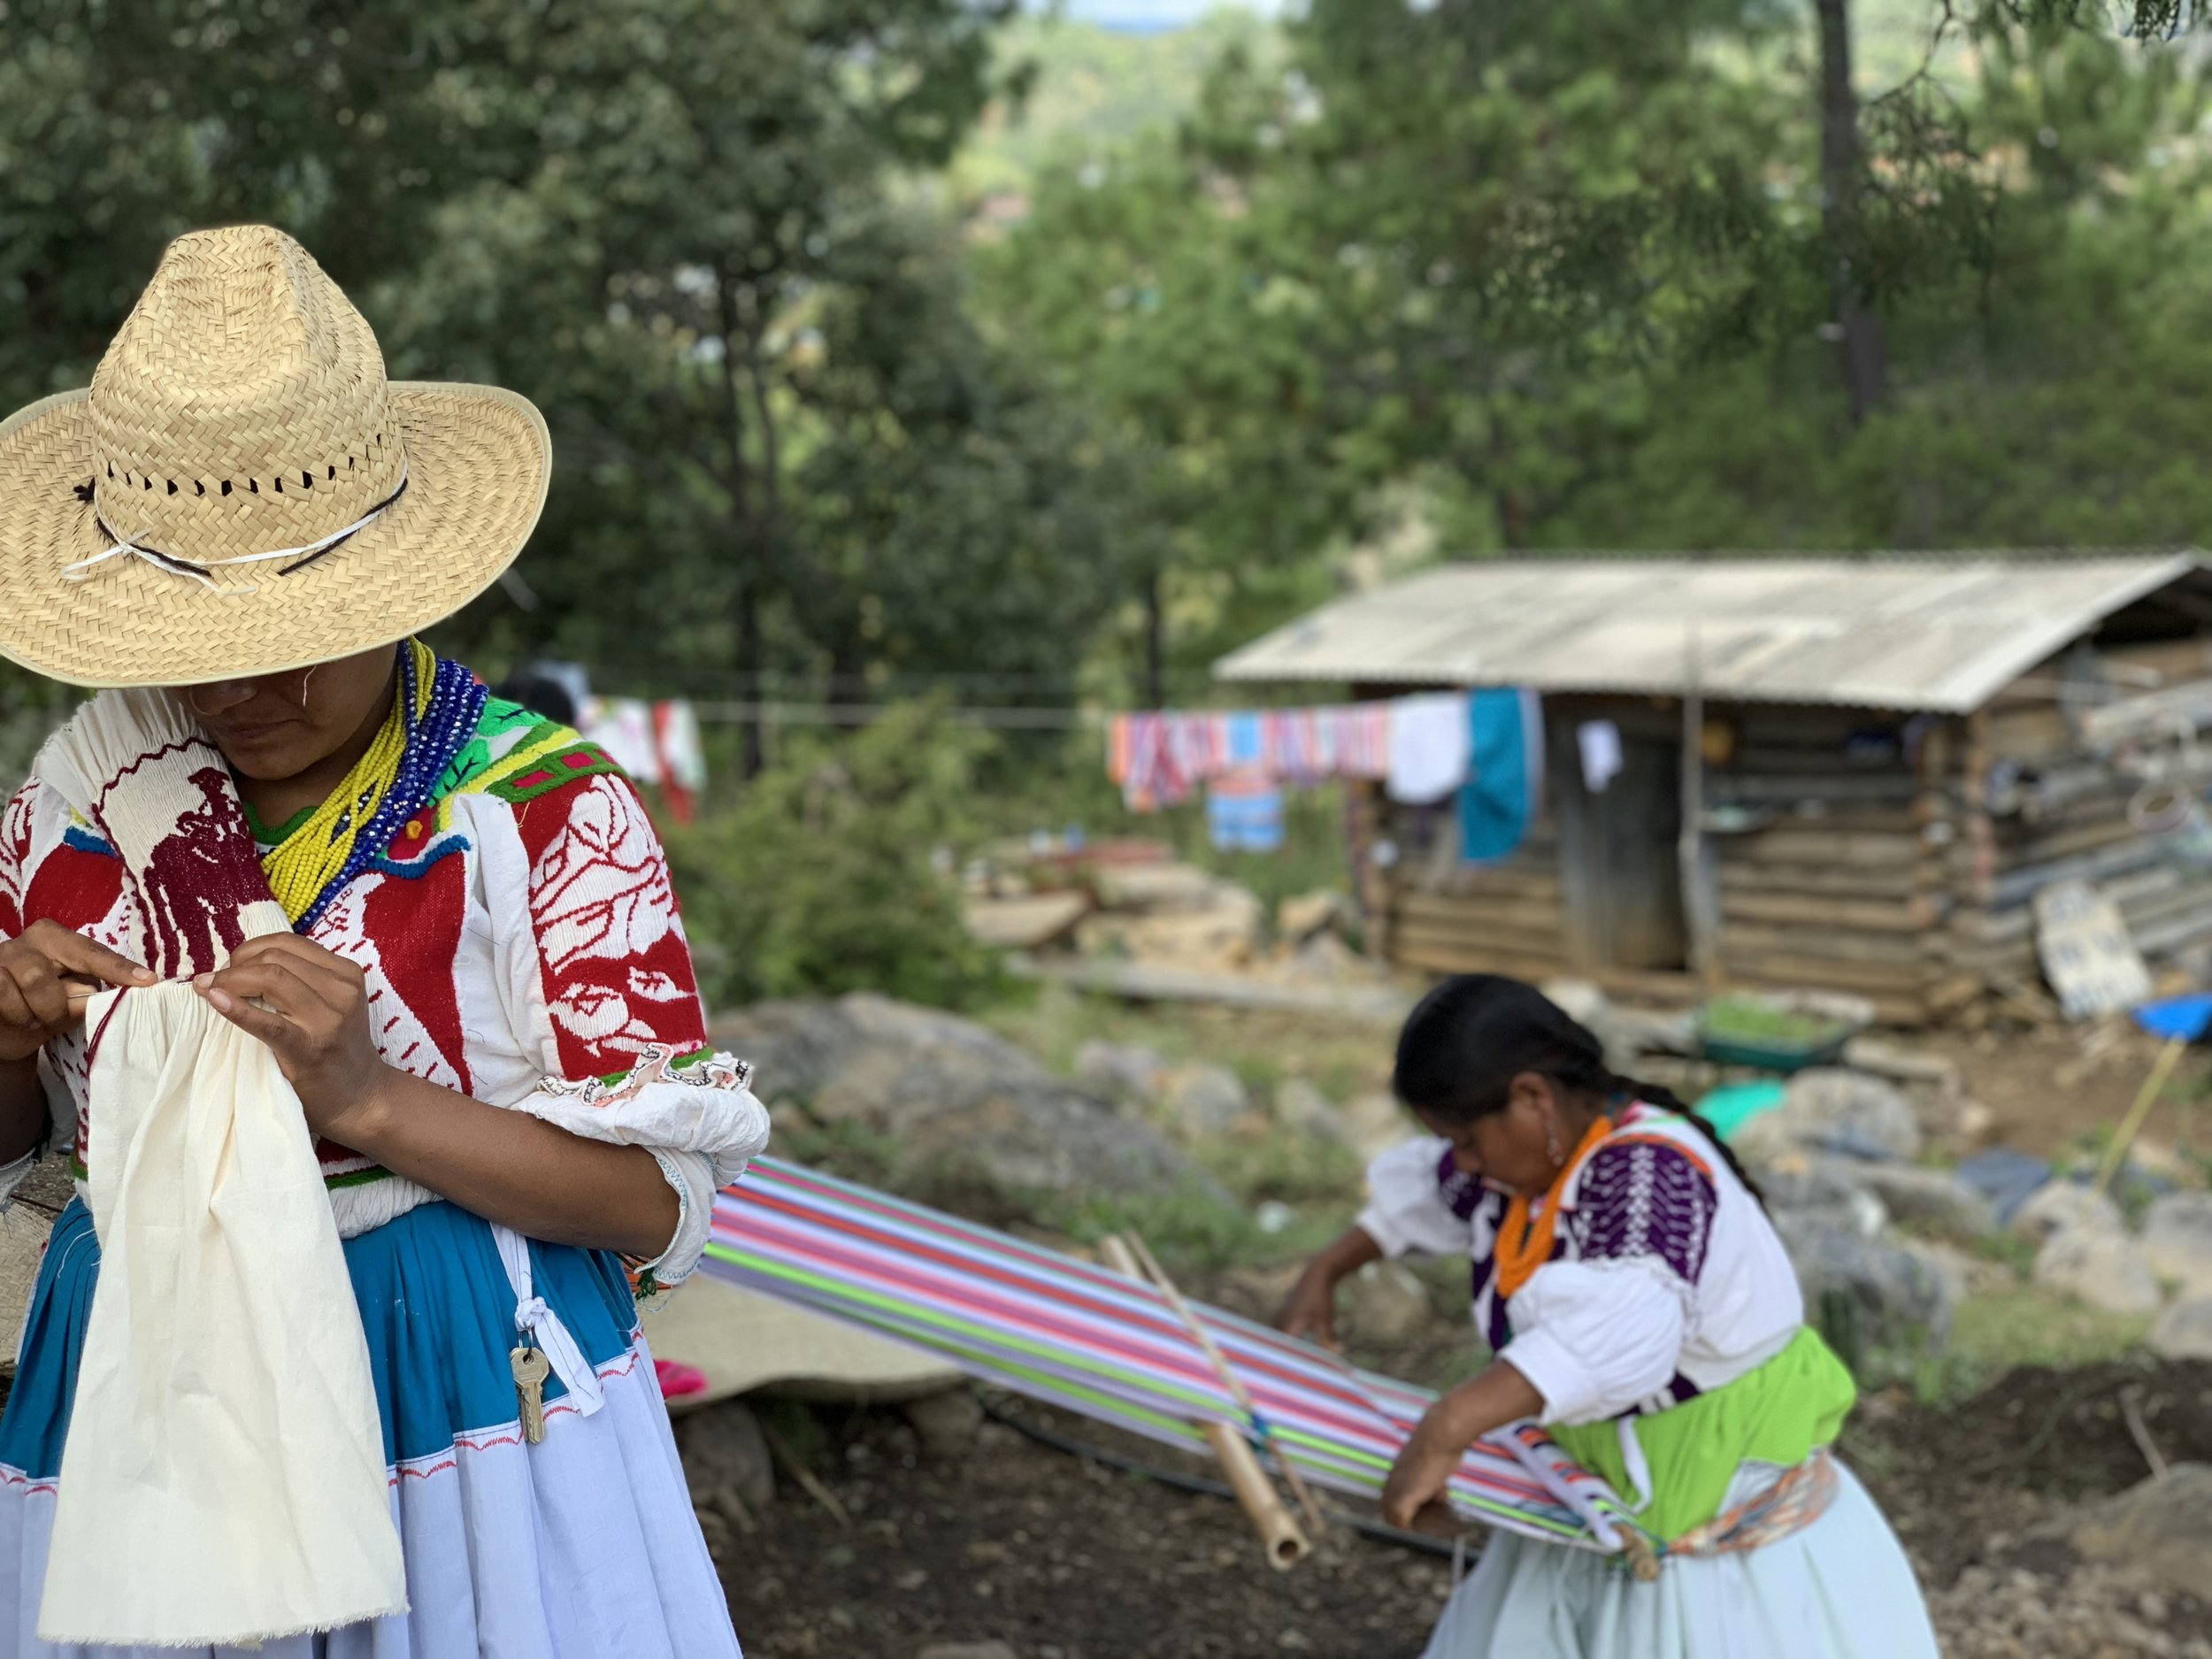 Discover artisanal Mexico